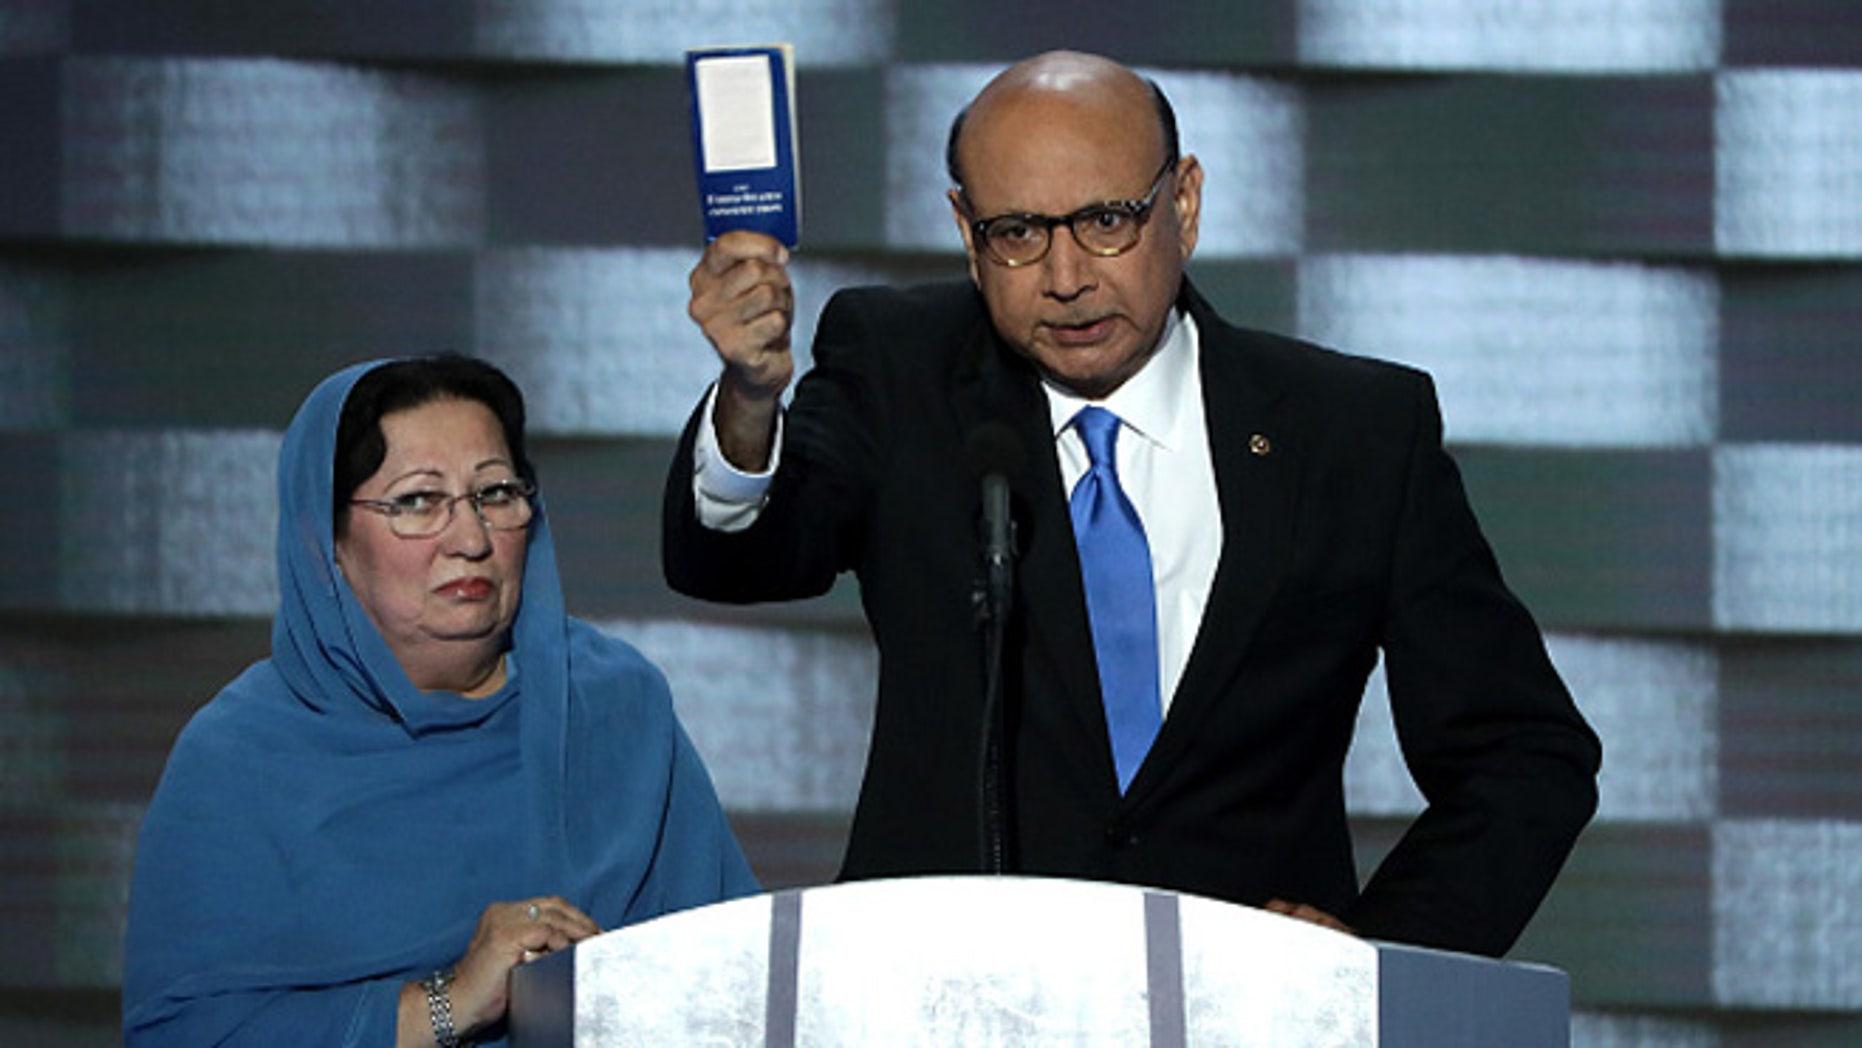 Khizr Khan, father of deceased Muslim U.S. Soldier Humayun S. M. Khan,  July 28, 2016 in Philadelphia, Pennsylvania.